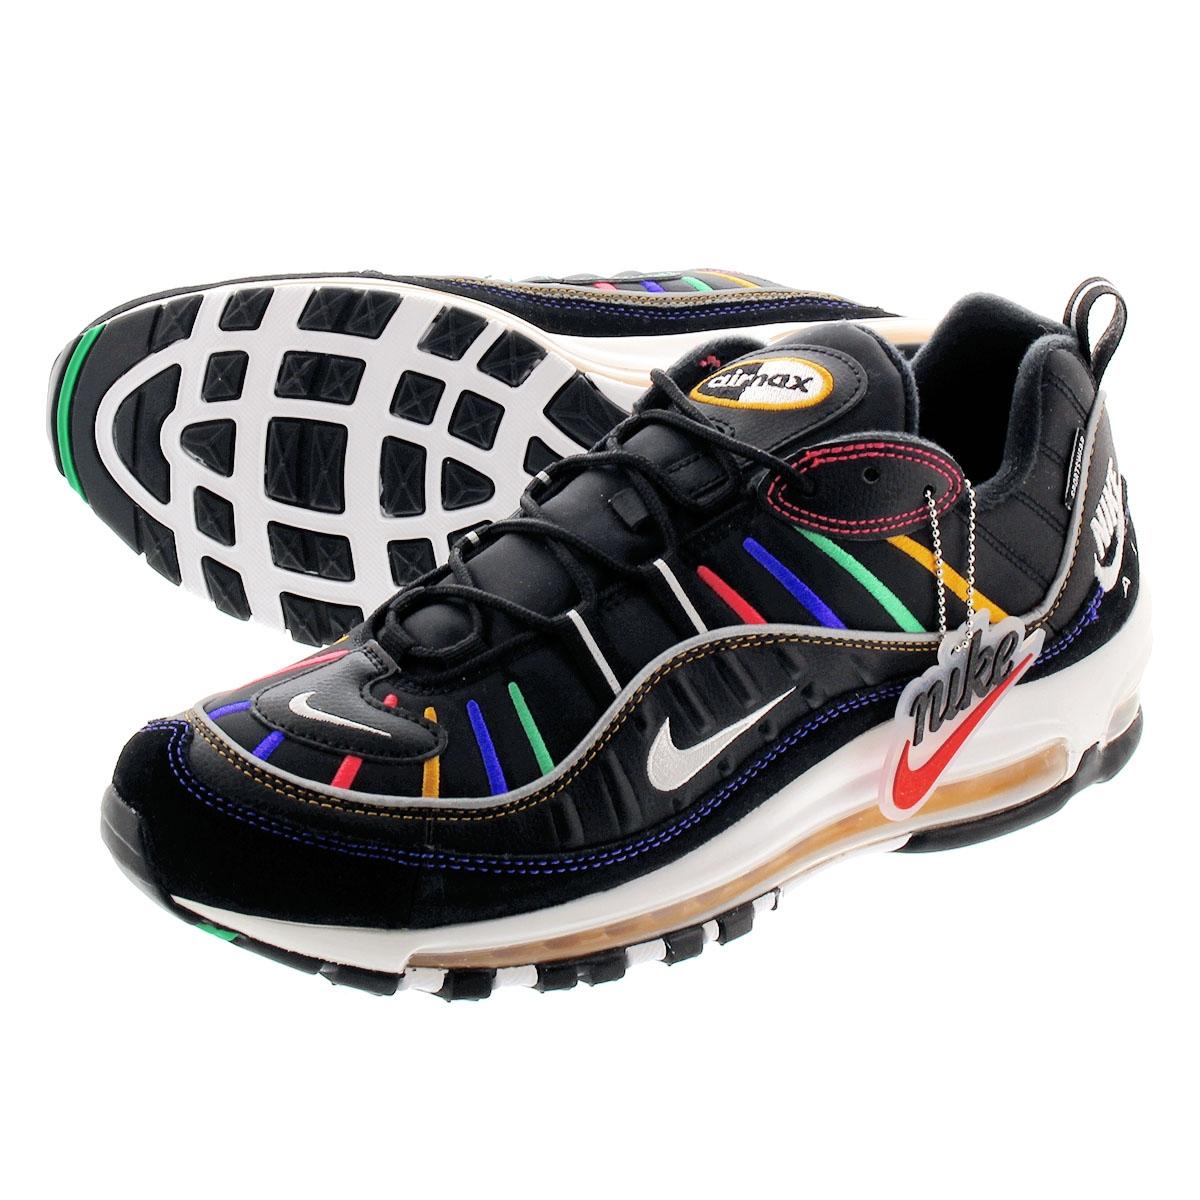 Nike Air Max 98 PRM (W) Black CI1901 023